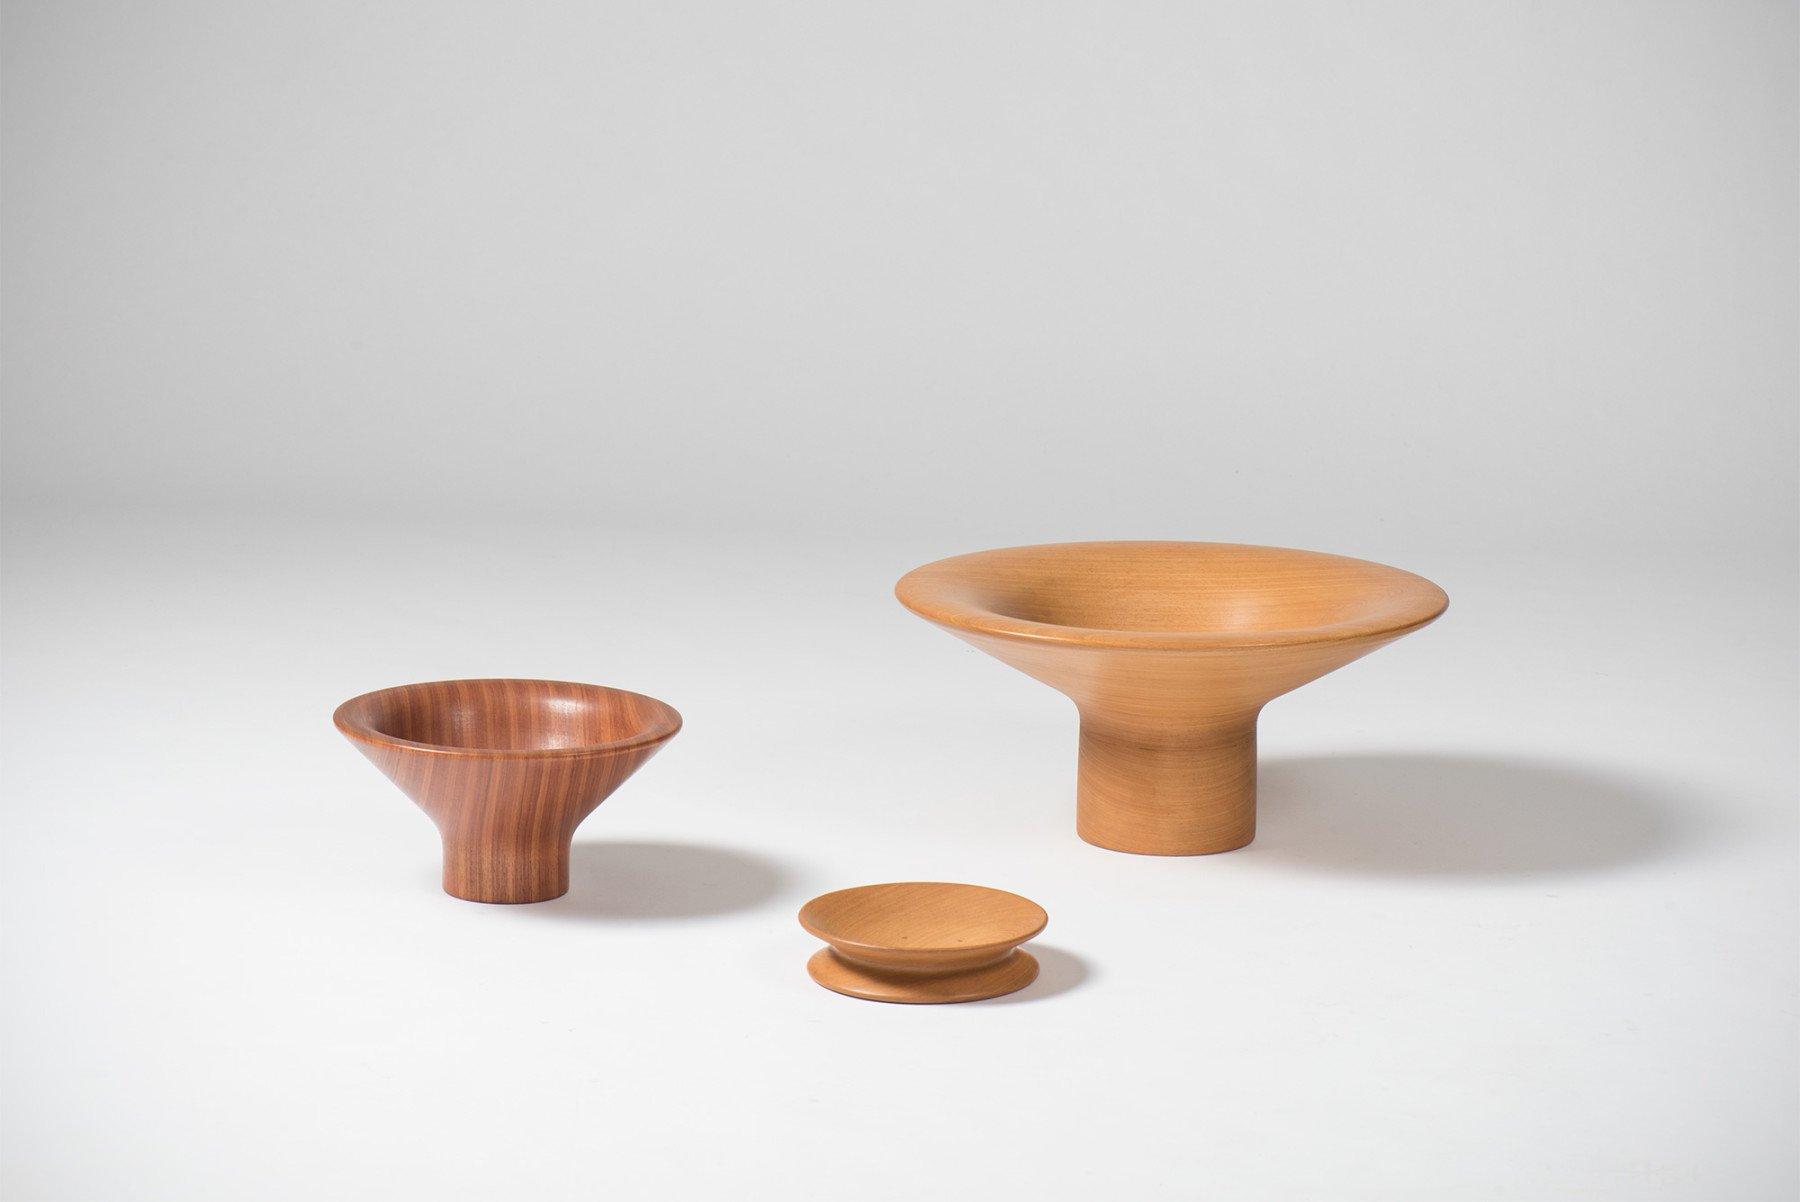 Angelo Mangiarotti |   Wooden objects, light wood